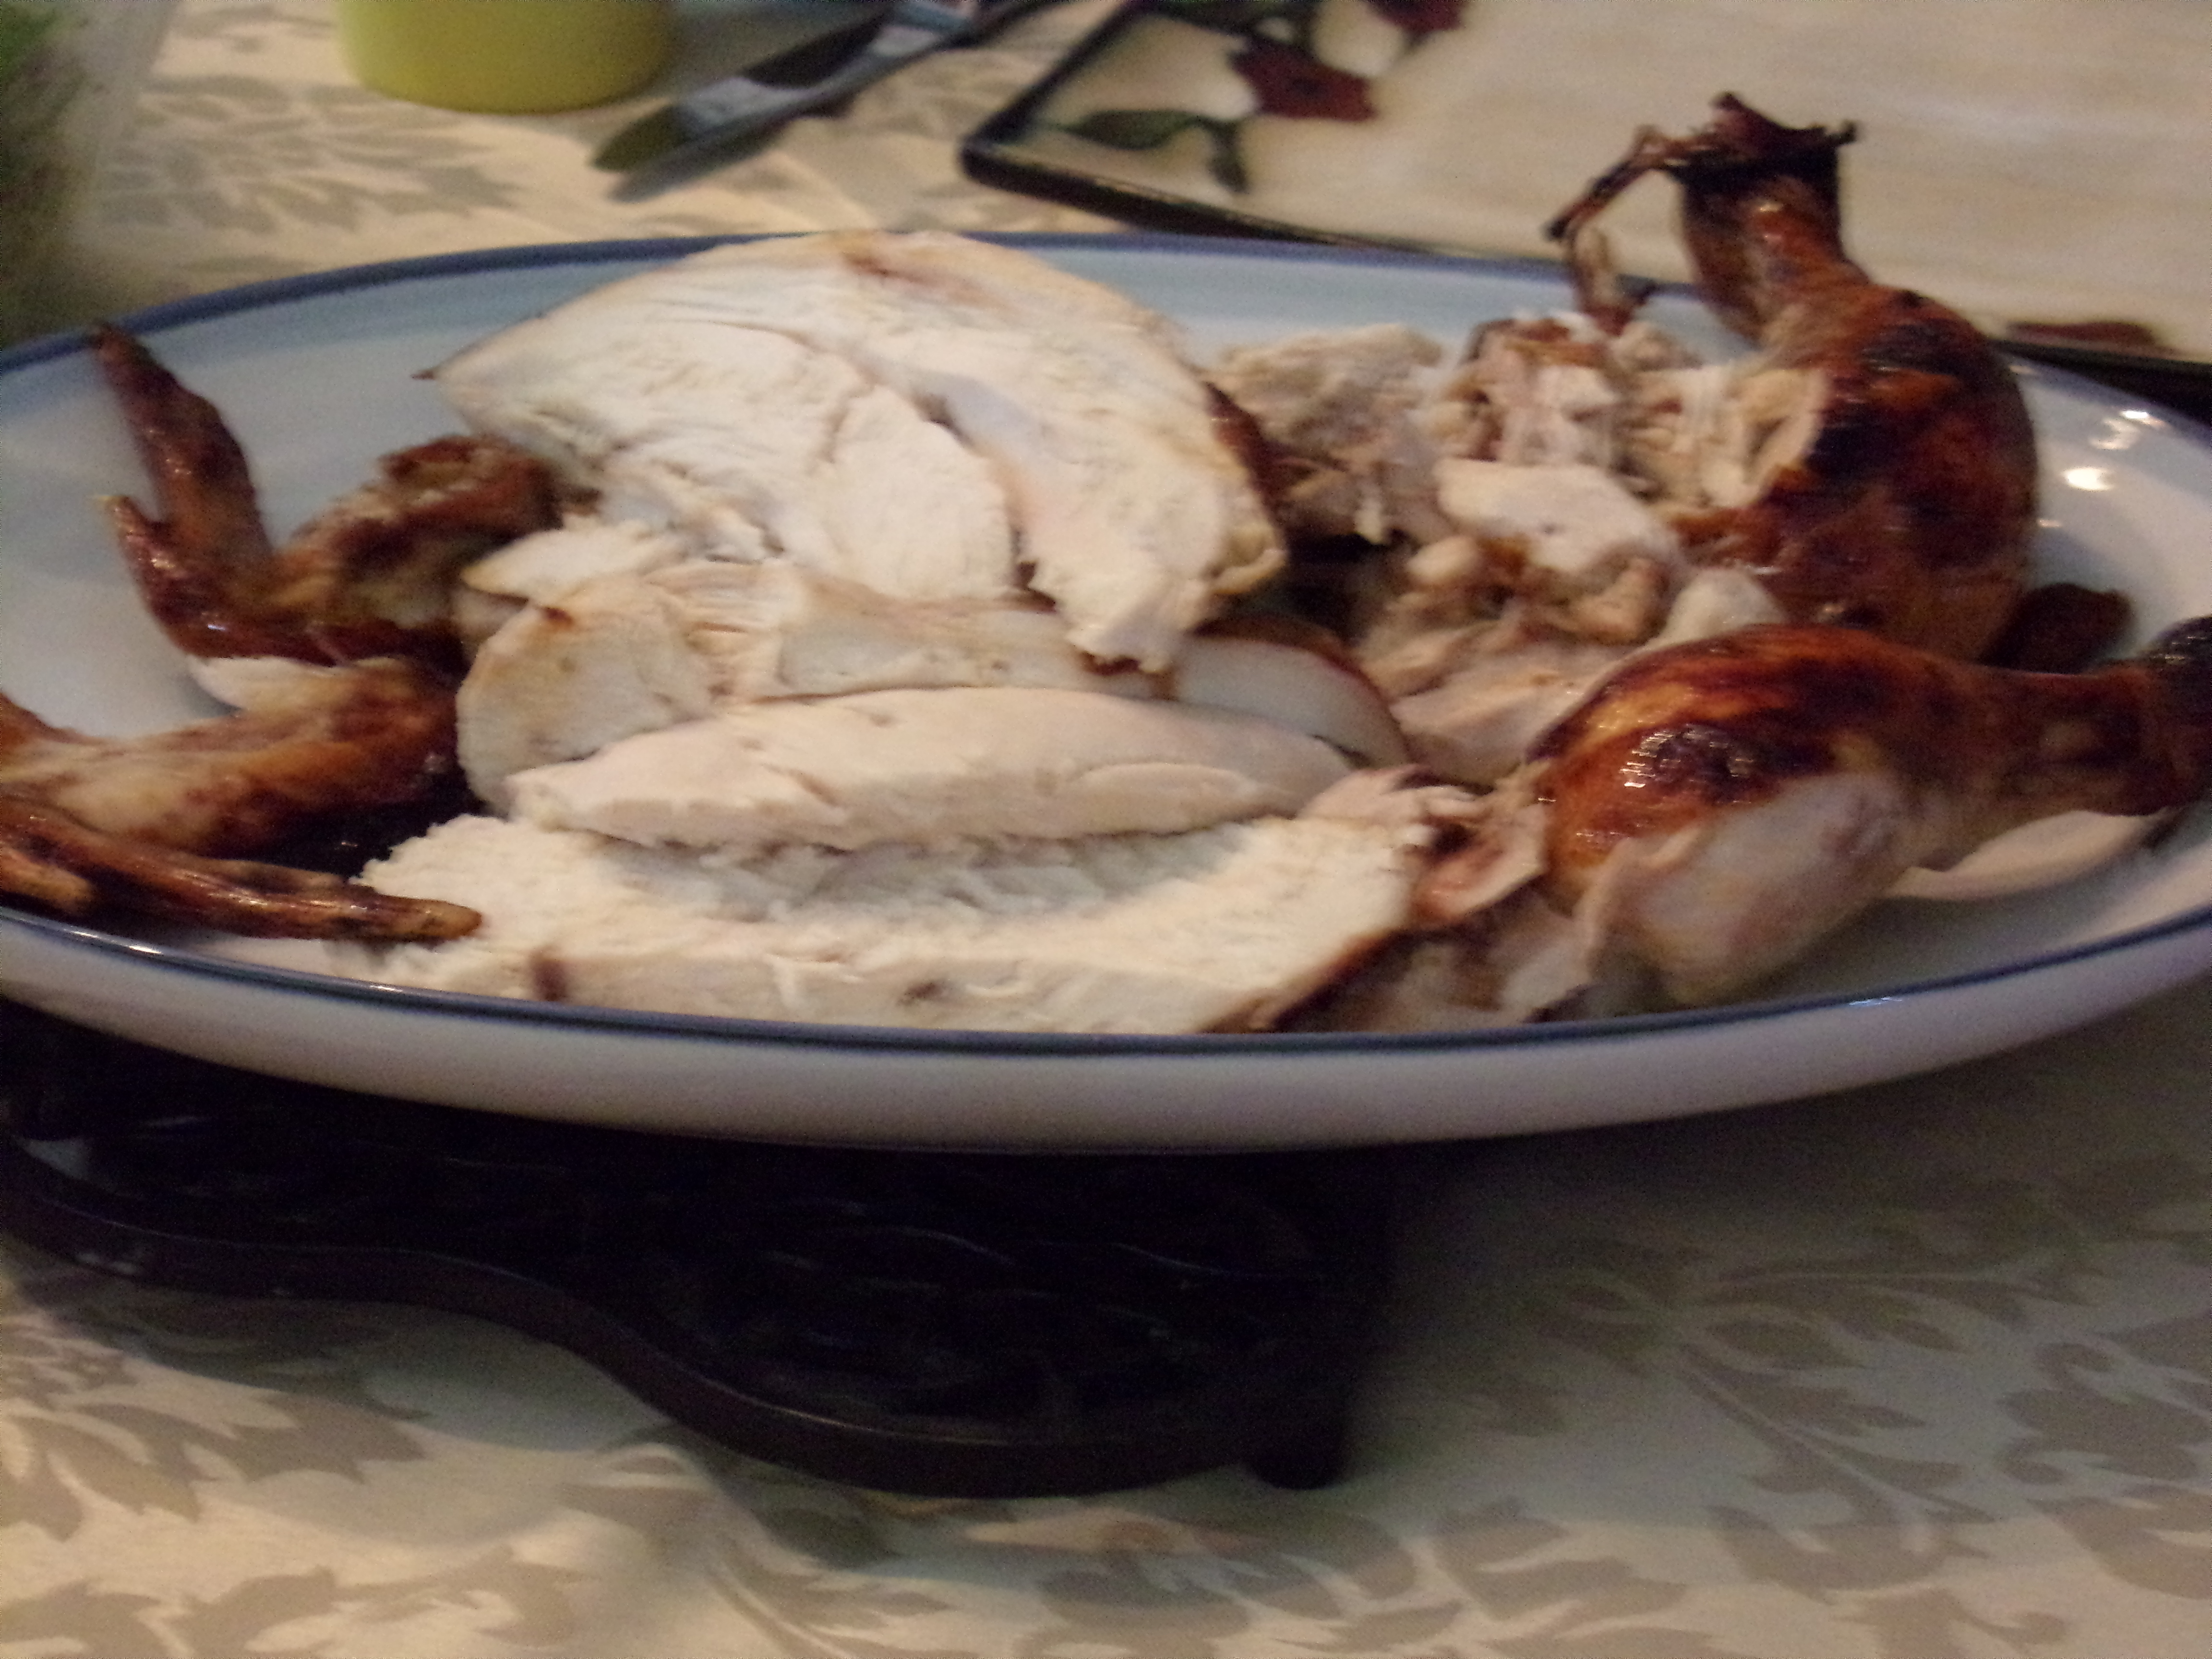 Pomegranate Chicken beancounter89